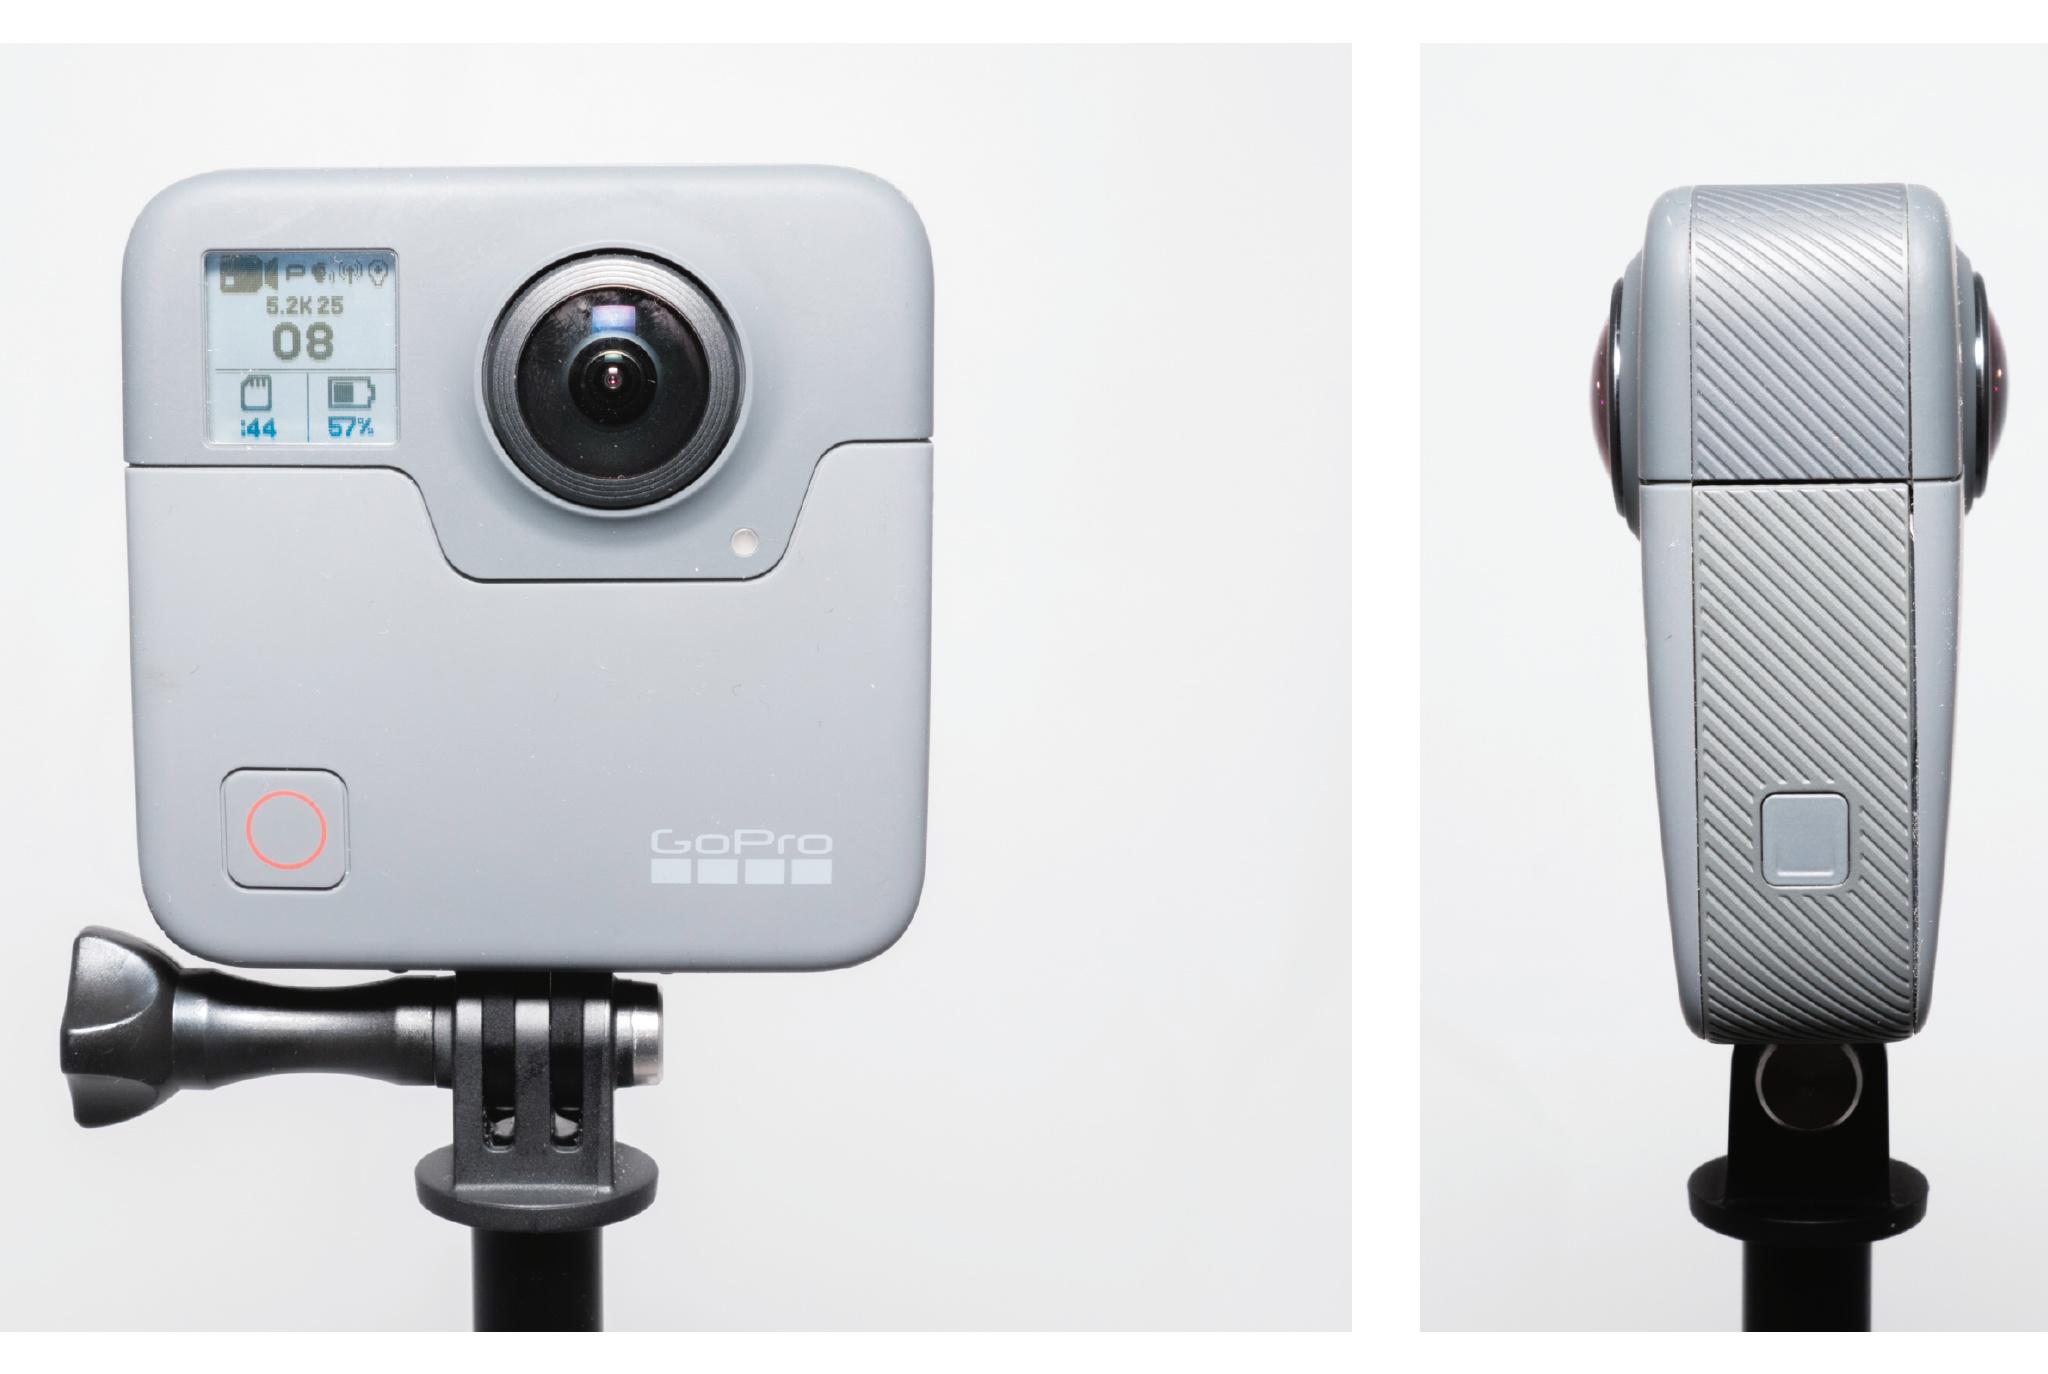 360 grad kamera gopro fusion im test c 39 t magazin. Black Bedroom Furniture Sets. Home Design Ideas